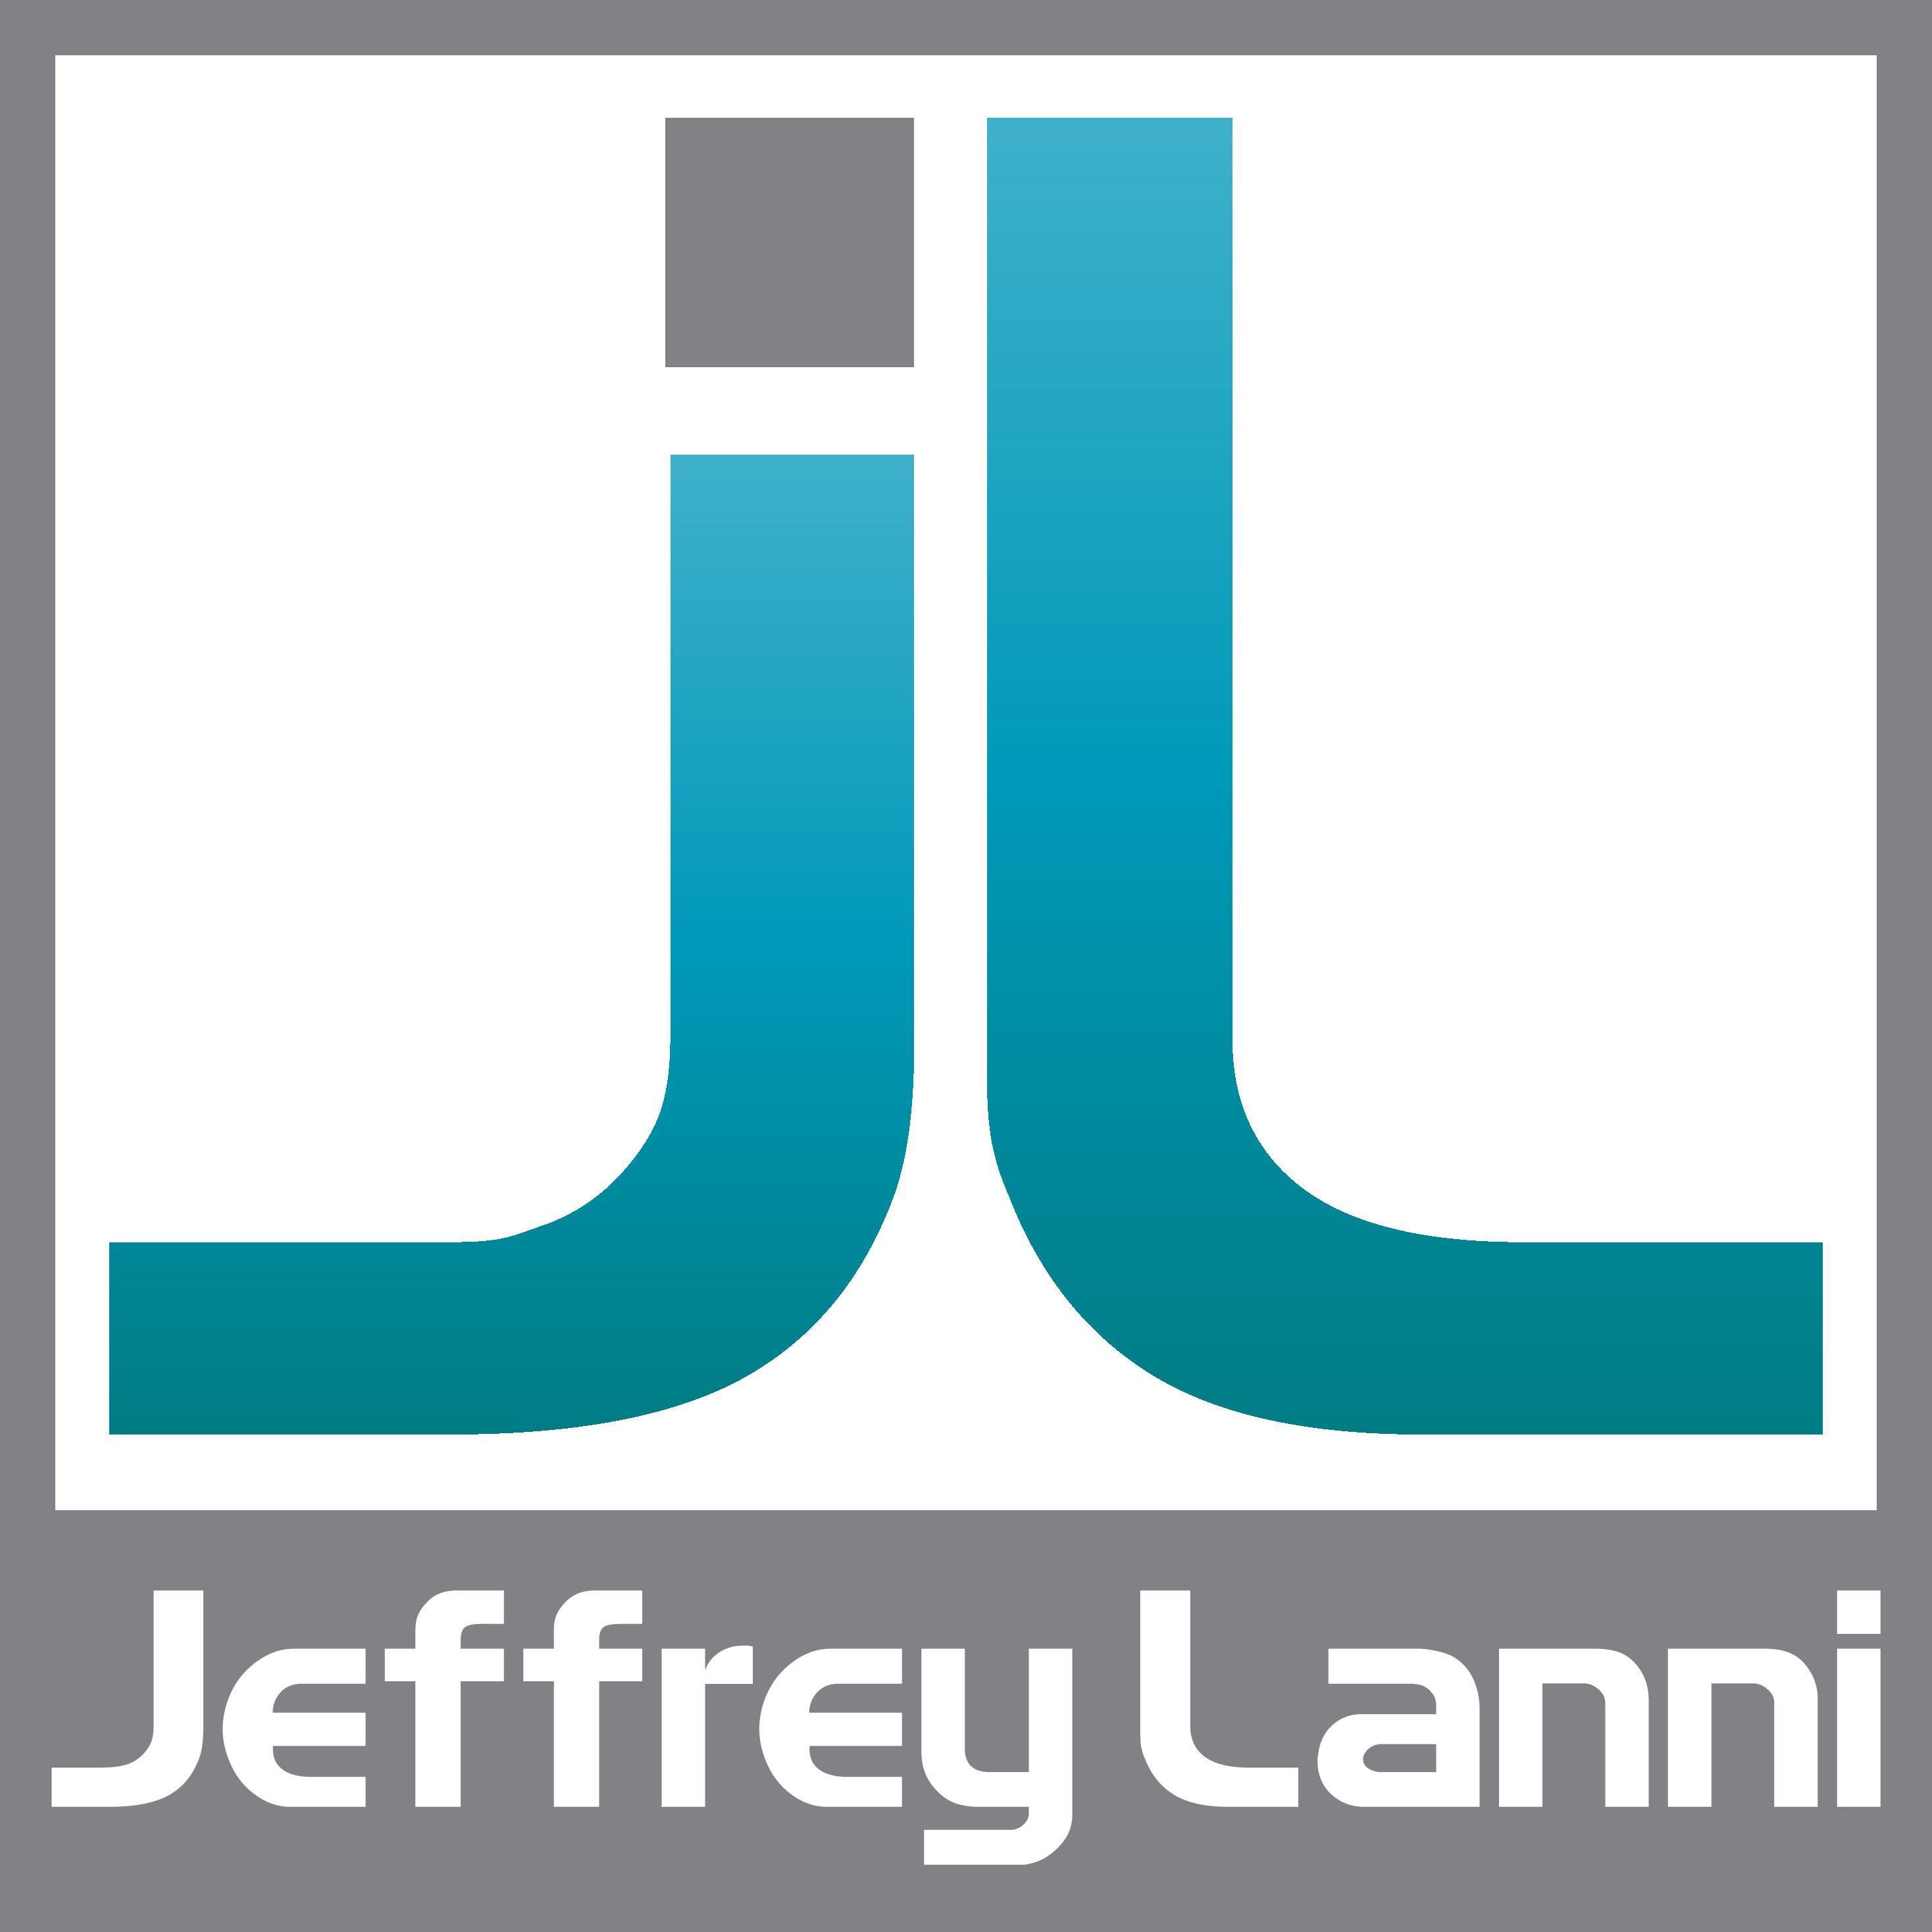 Jeffrey Lanni - Online MLM Leader & Homebased Business Entrepreneur